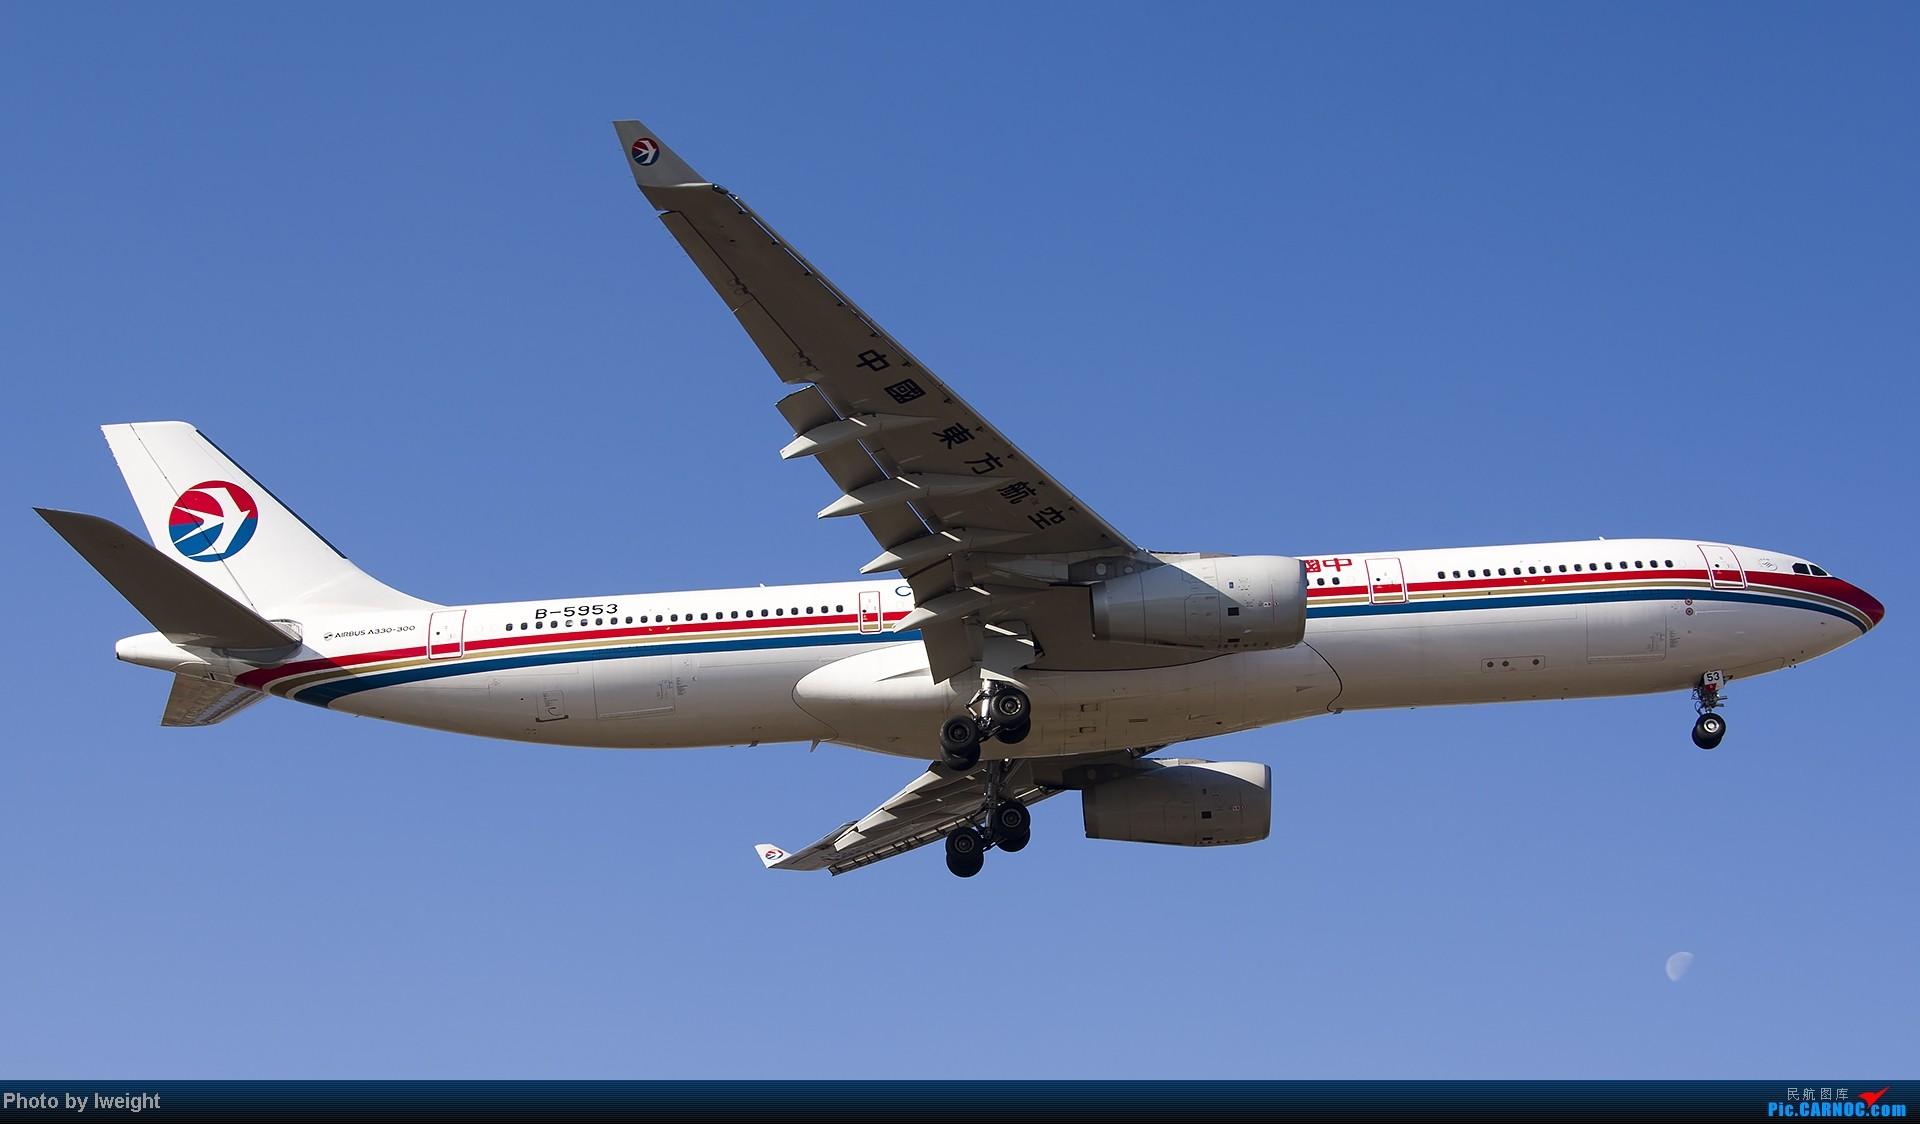 Re:[原创]抓住APEC蓝的尾巴,再拍上一组 AIRBUS A330-300 B-5953 中国北京首都机场